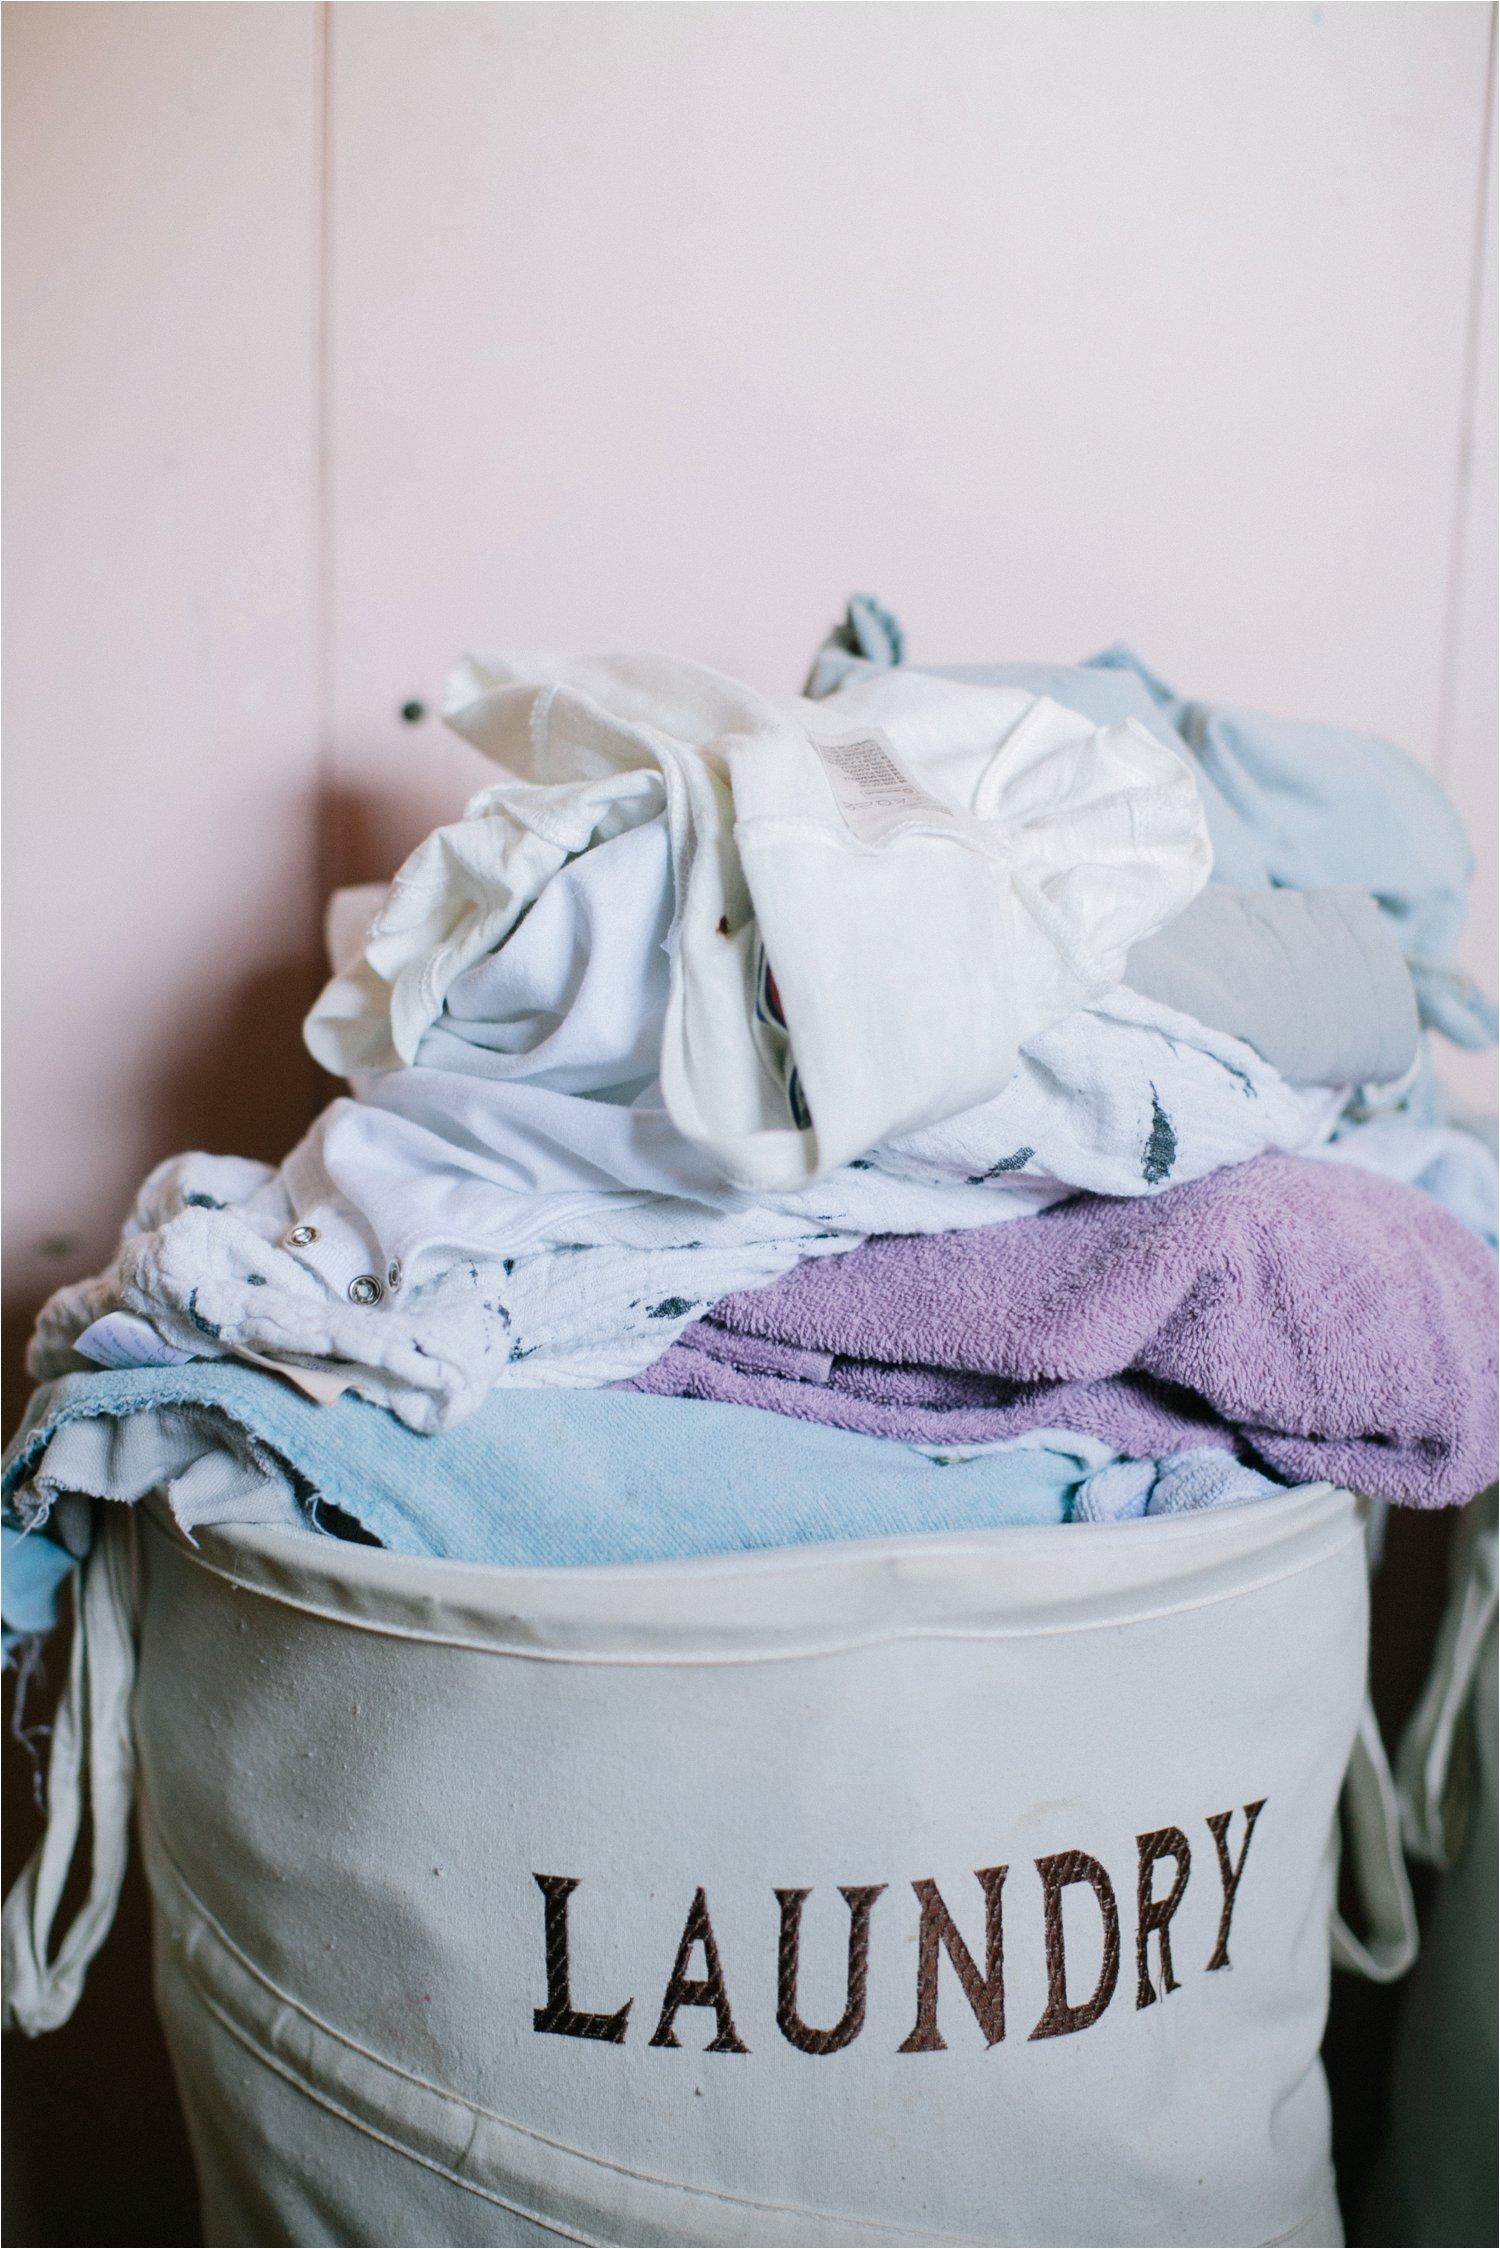 Miele Laundry Experience wastips